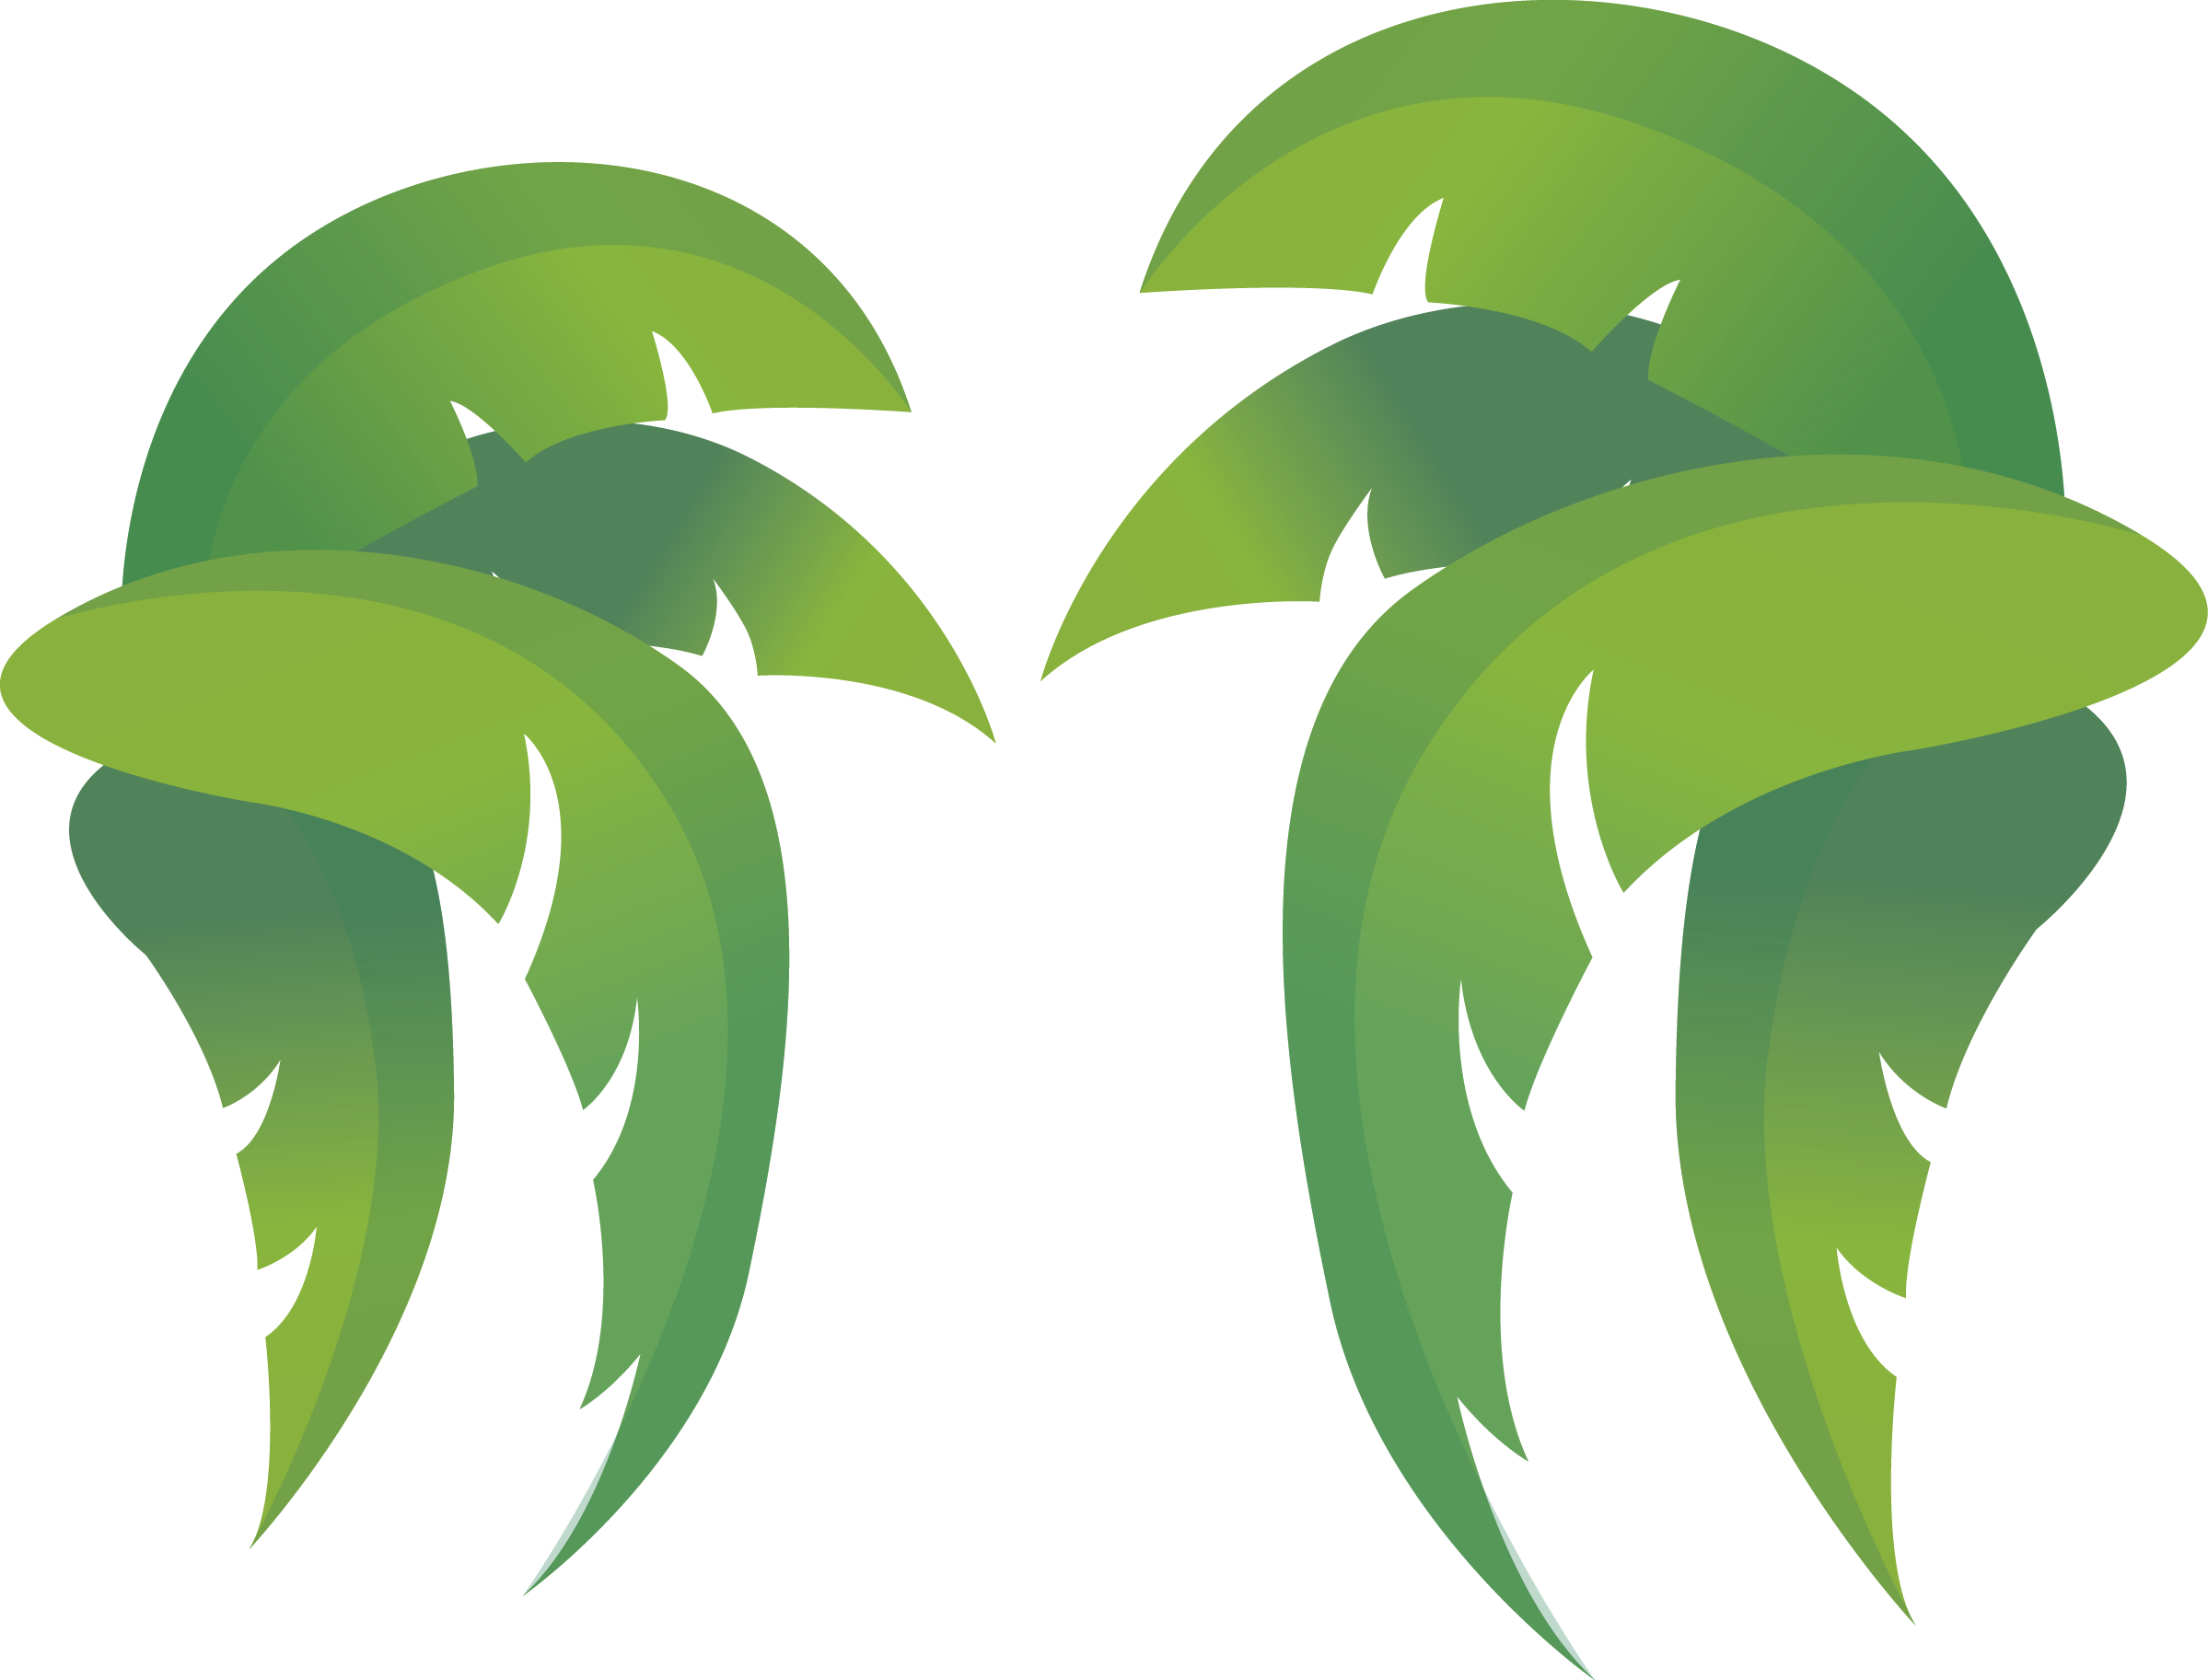 Watermelon clipart leaf. Coconut clip art leaves